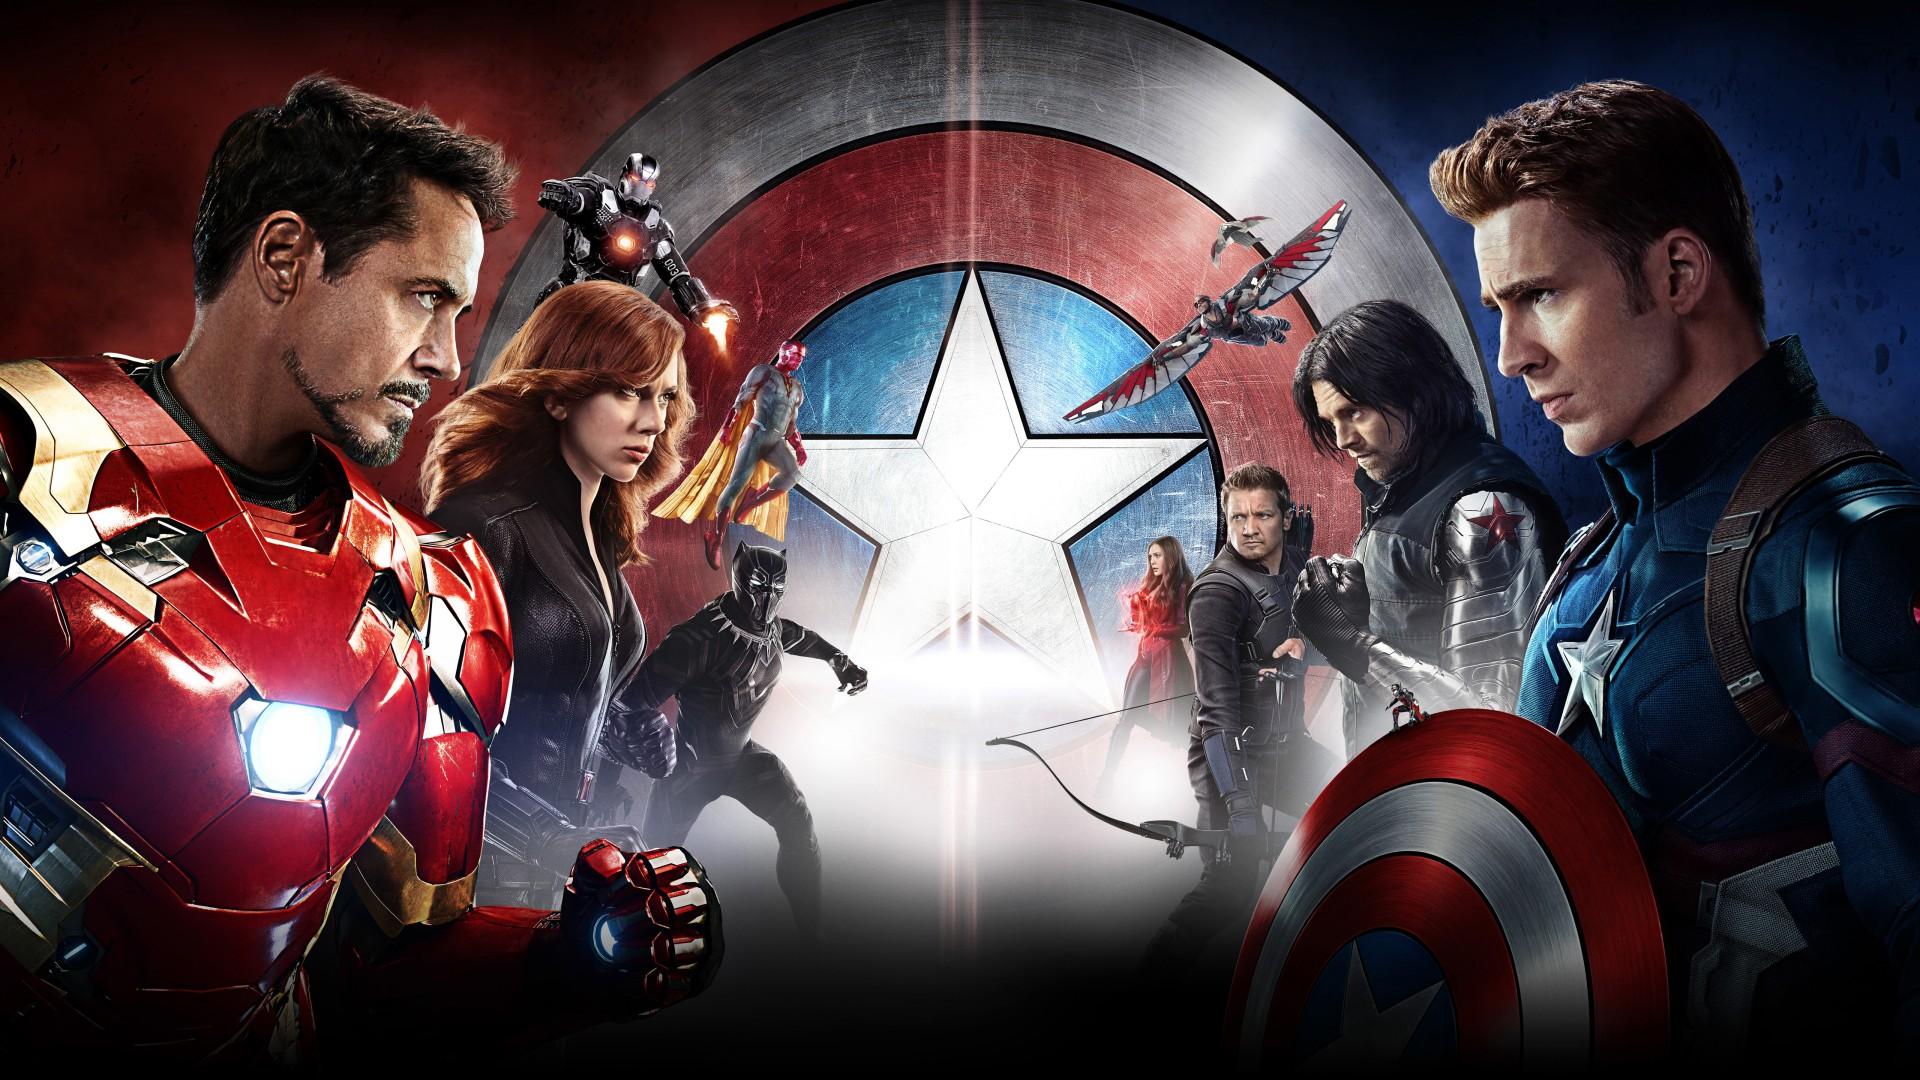 Wallpaper 3d Iphone X Captain America Civil War 5k Hd Wallpapers Hd Wallpapers